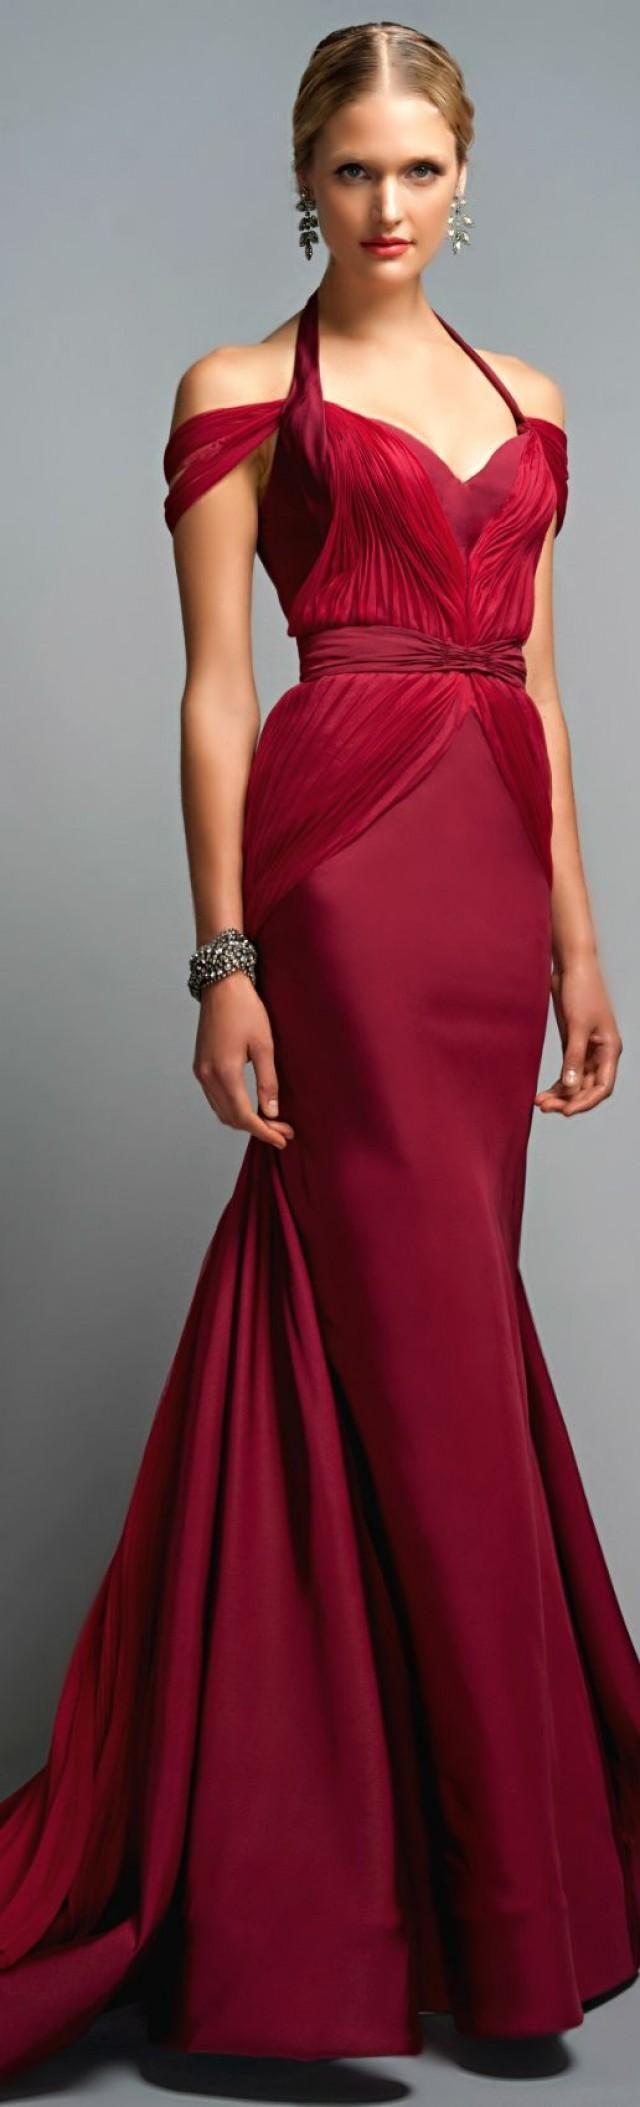 295 best Dresses images on Pinterest | Fashion show, High fashion ...